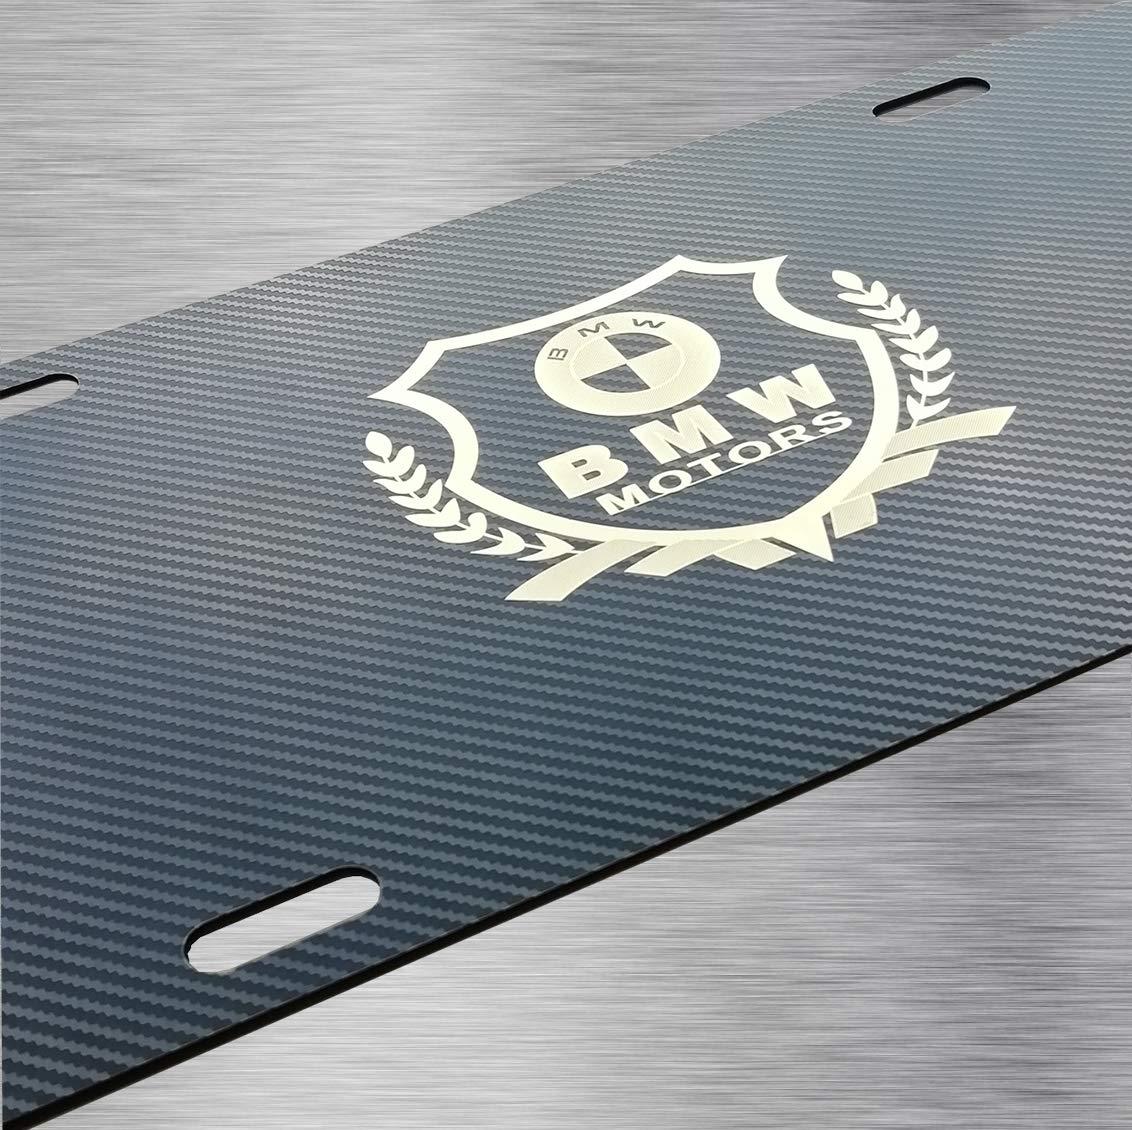 Lexus Logo Golden Exquisite Carbon Fiber Grain Stainless Steel License Plate Cover,Carbon Fiber License Plate Frame for Lexus